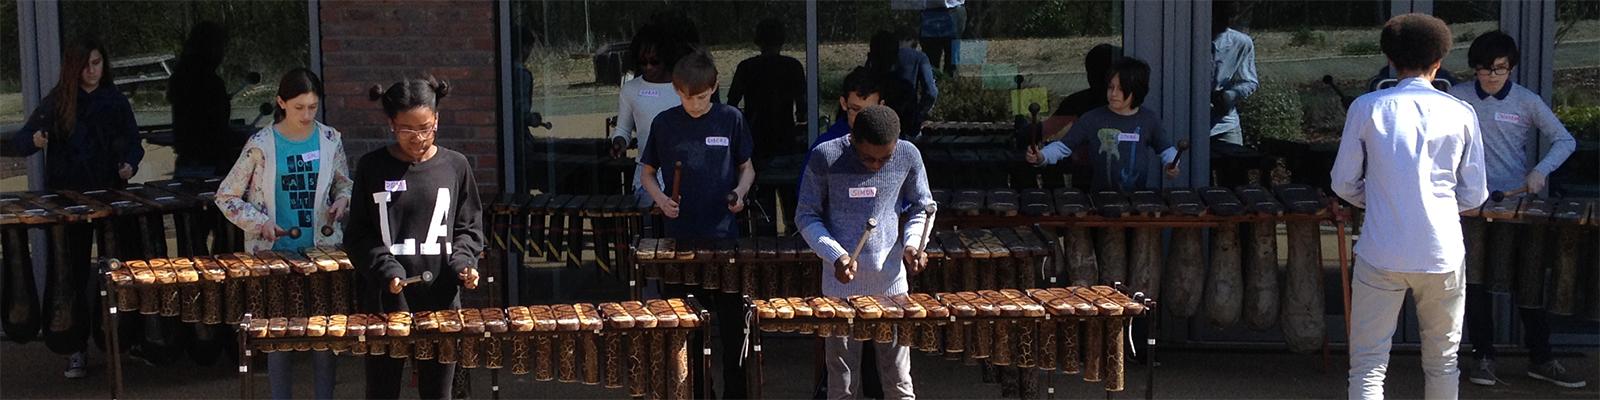 Diversity Day African Marimba Workshops London